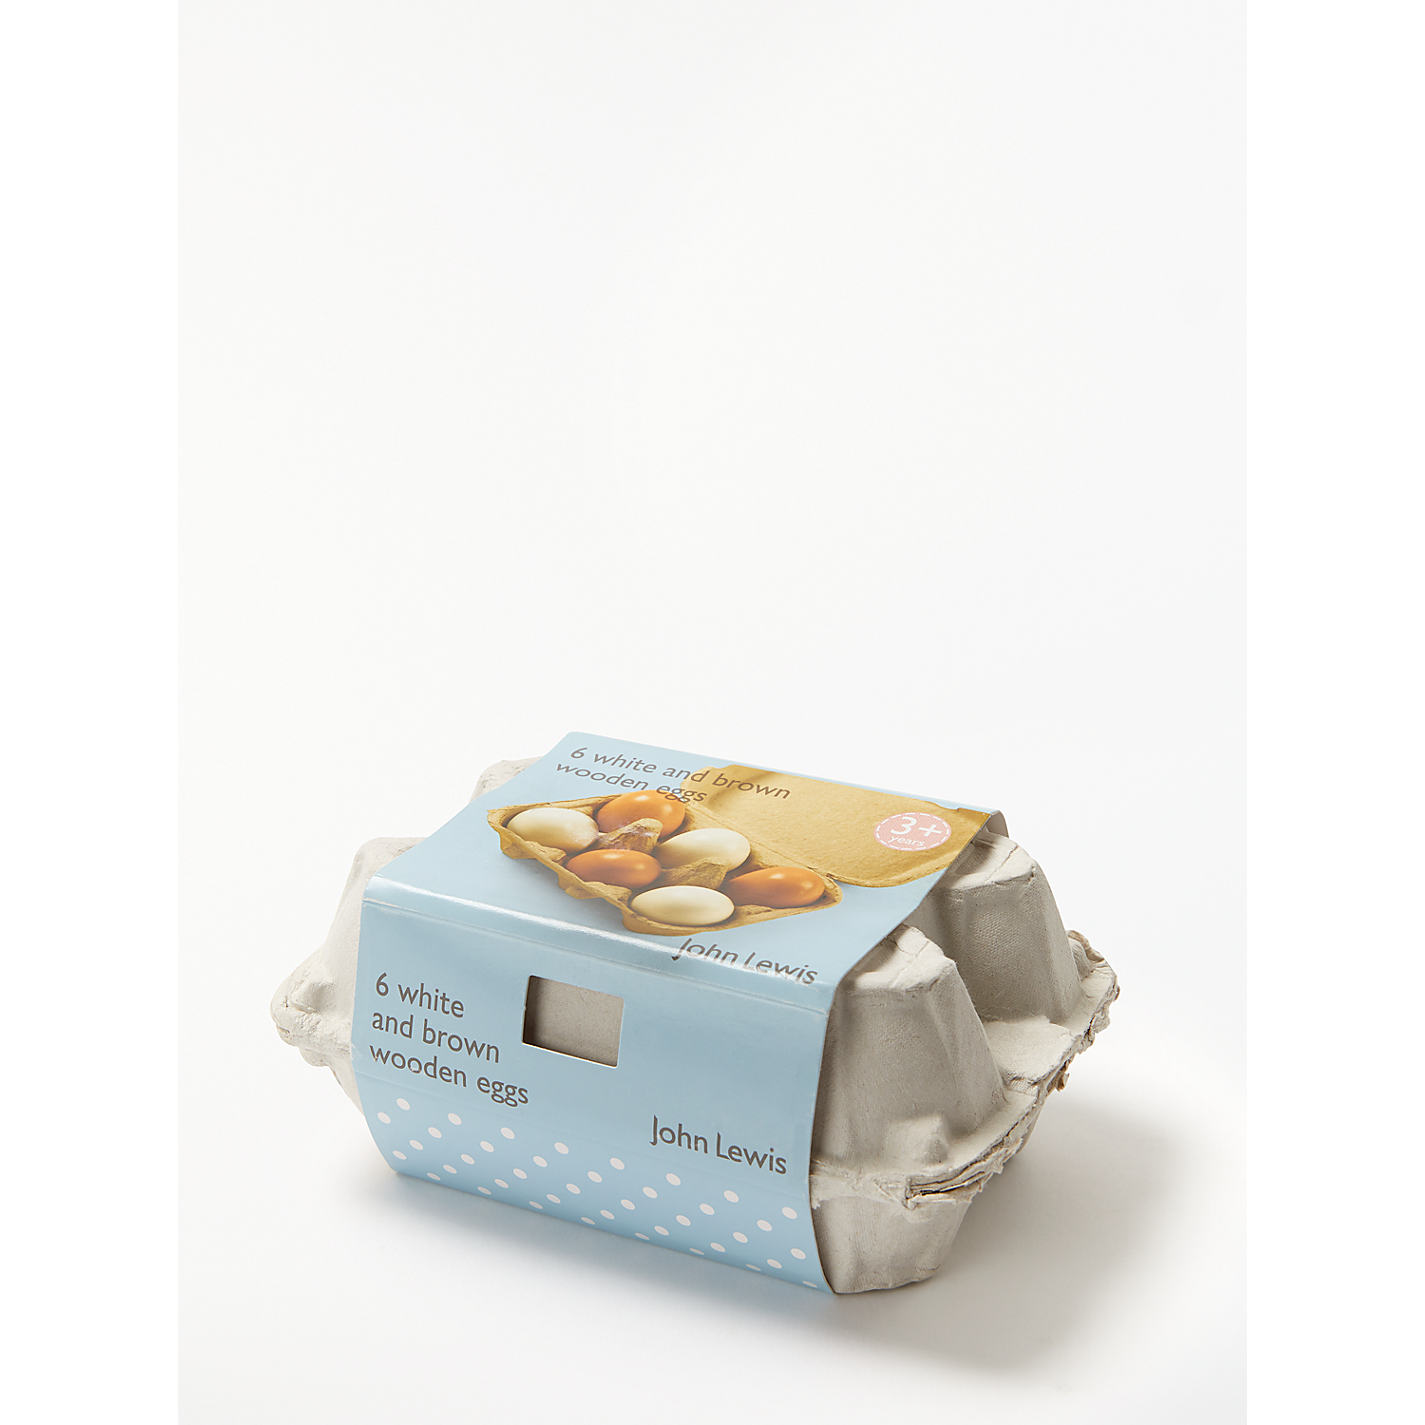 Buy john lewis eggs in a box john lewis buy john lewis eggs in a box online at johnlewis negle Choice Image